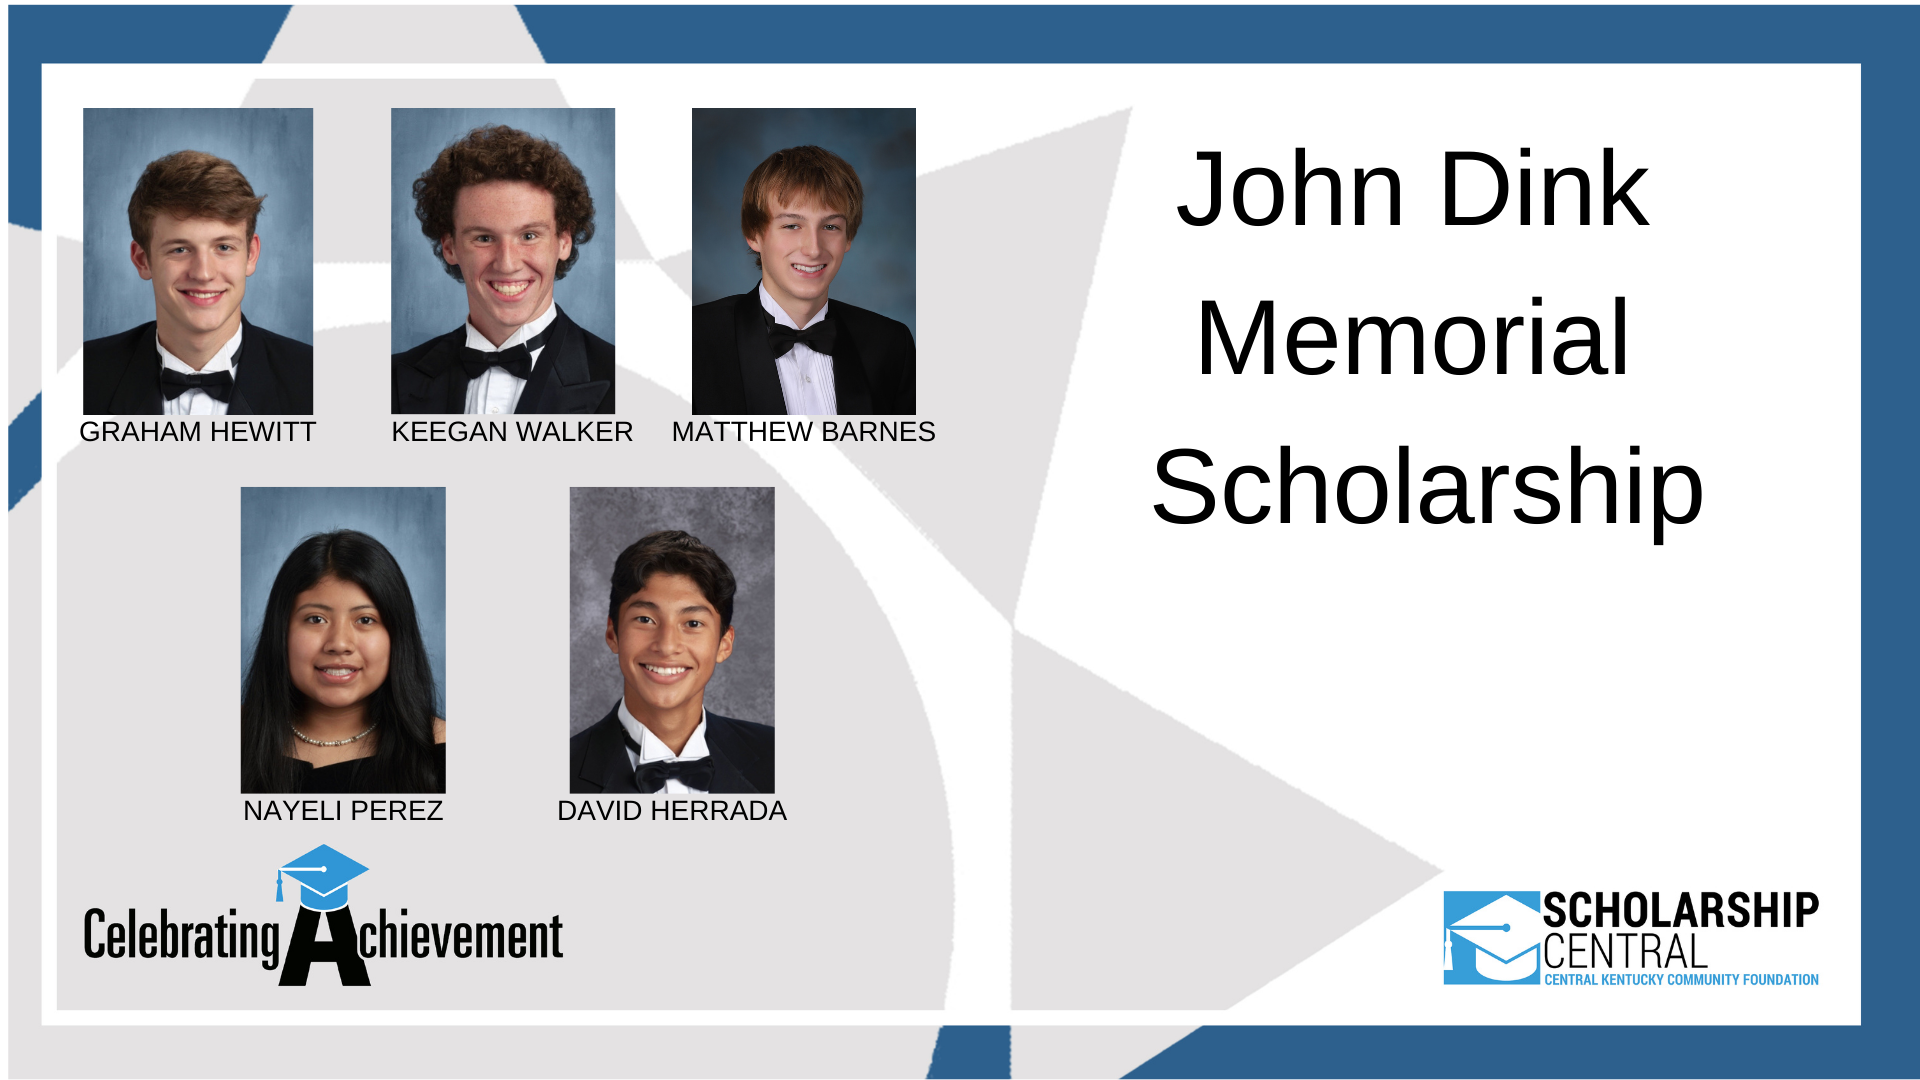 John Dink Memorial Scholarship Winners 2